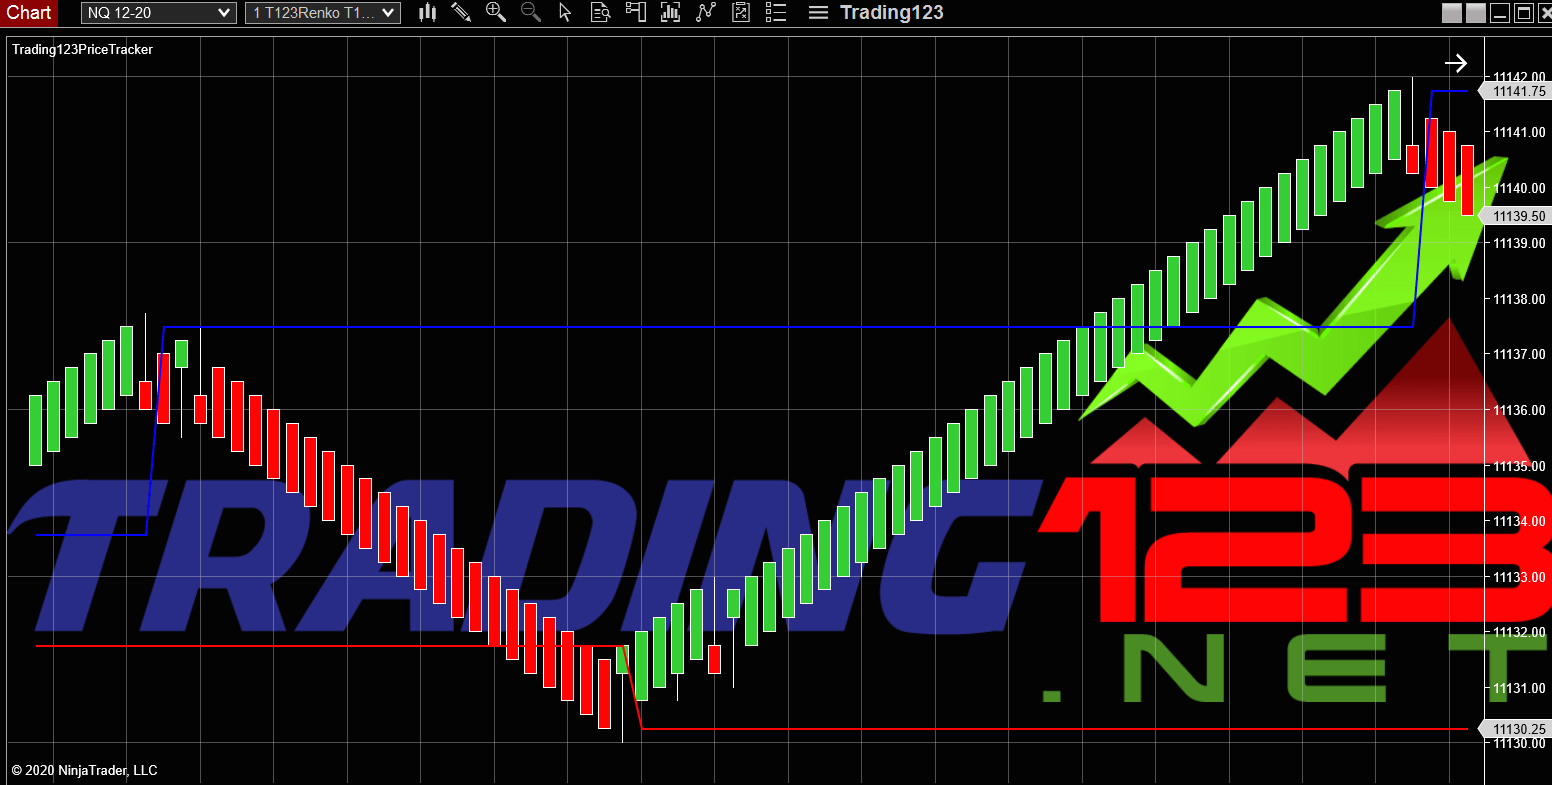 Ninjatrader Indicators